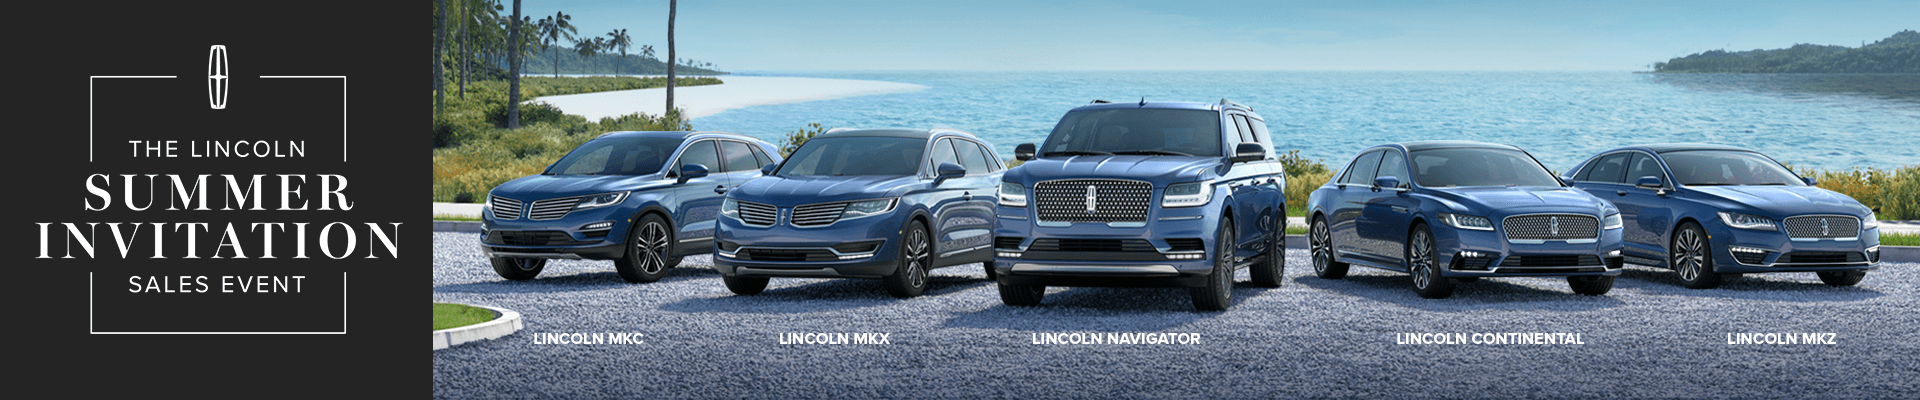 The Lincoln Summer Invitation Sales Event